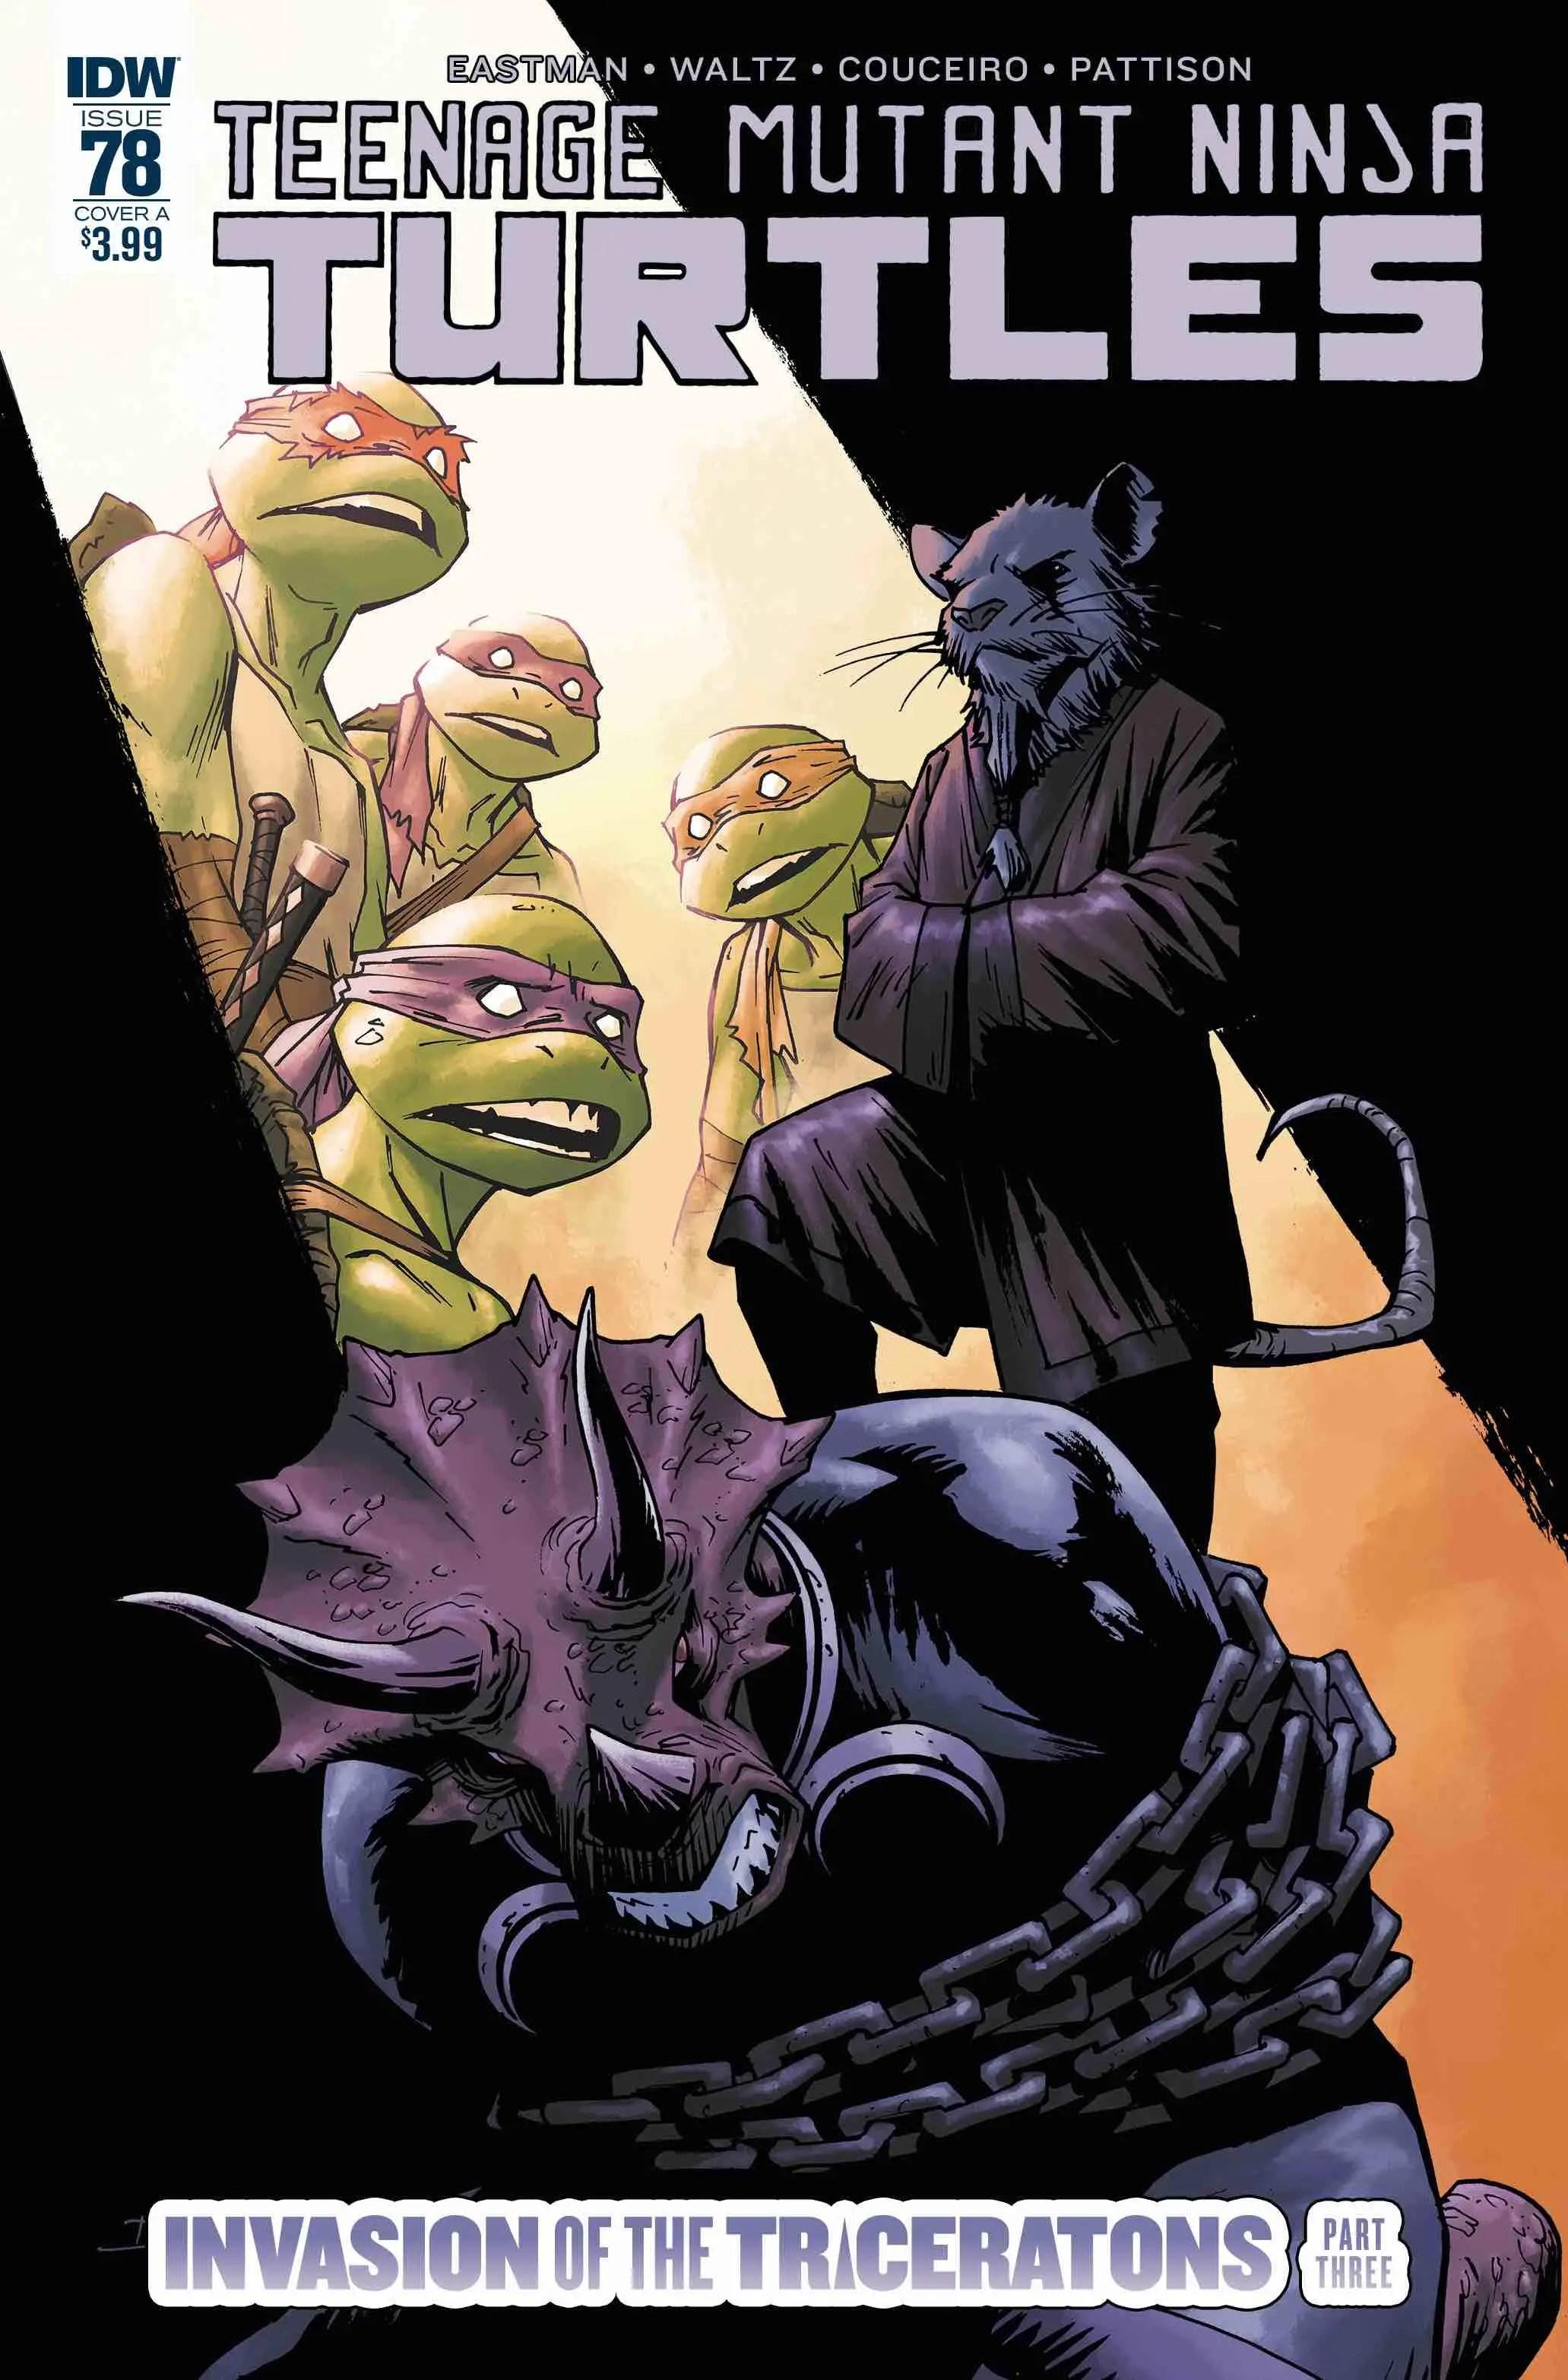 Teenage Mutant Ninja Turtles #78 Review